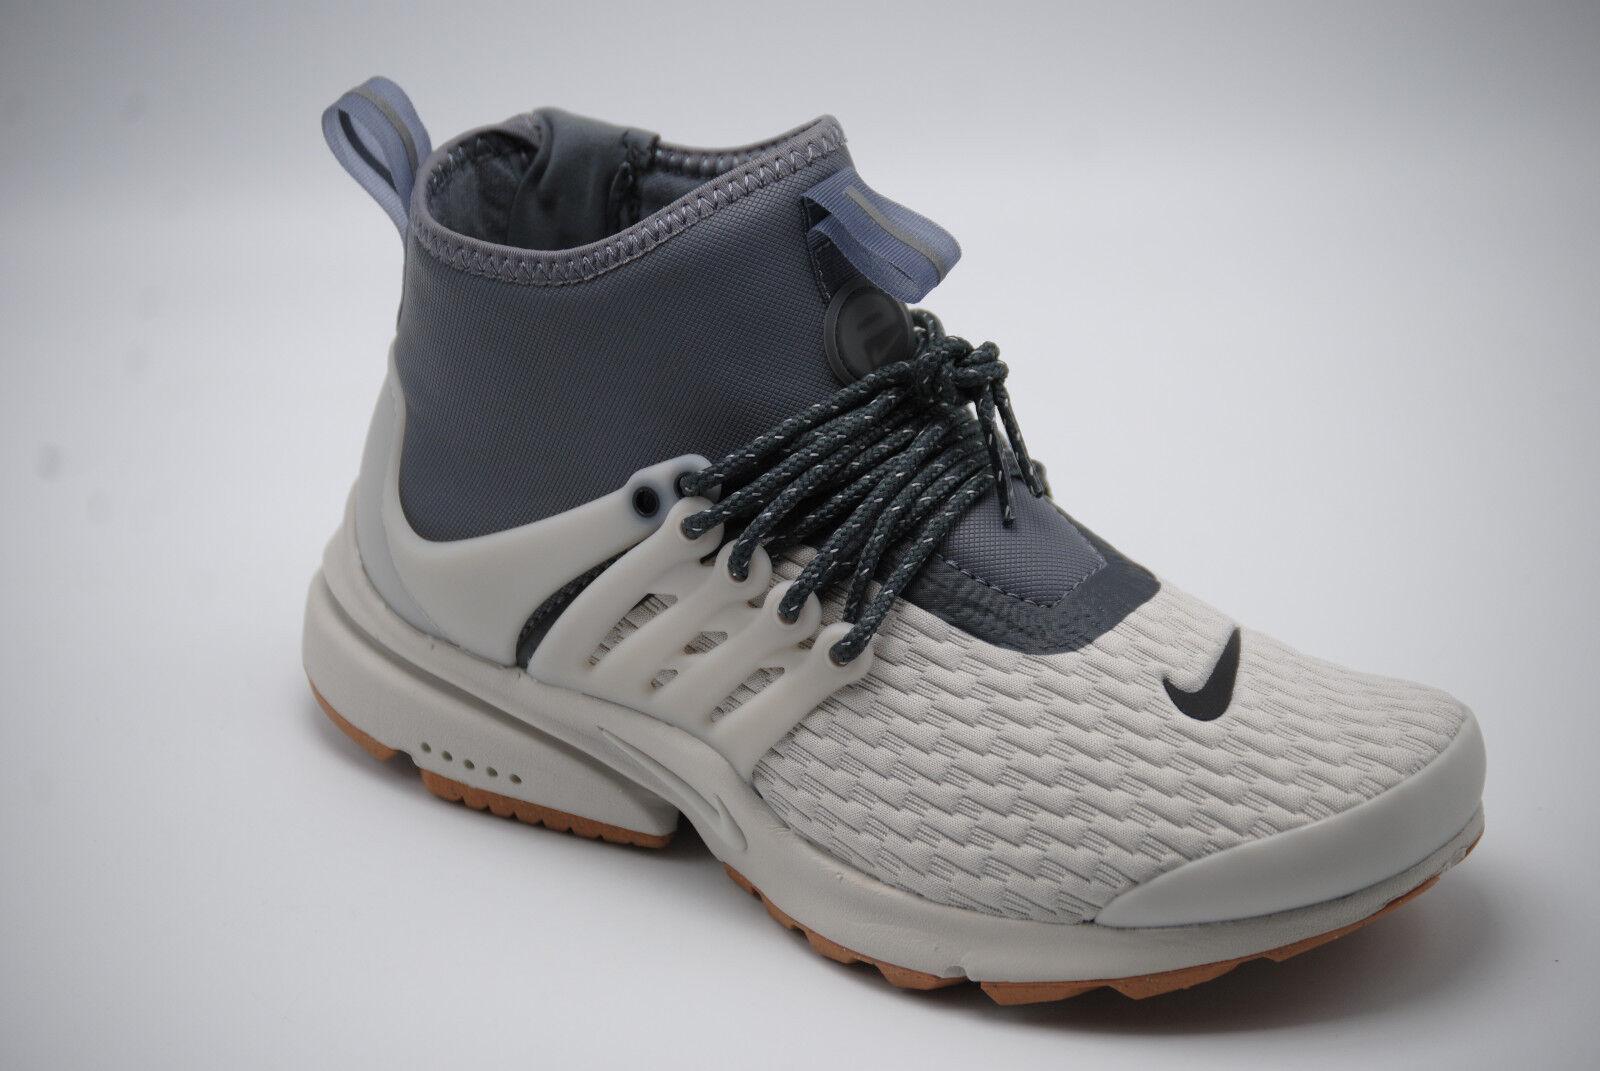 Nike Air Presto Mid Utility PRM Women's sneakers AA0674 001 Multiple sizes